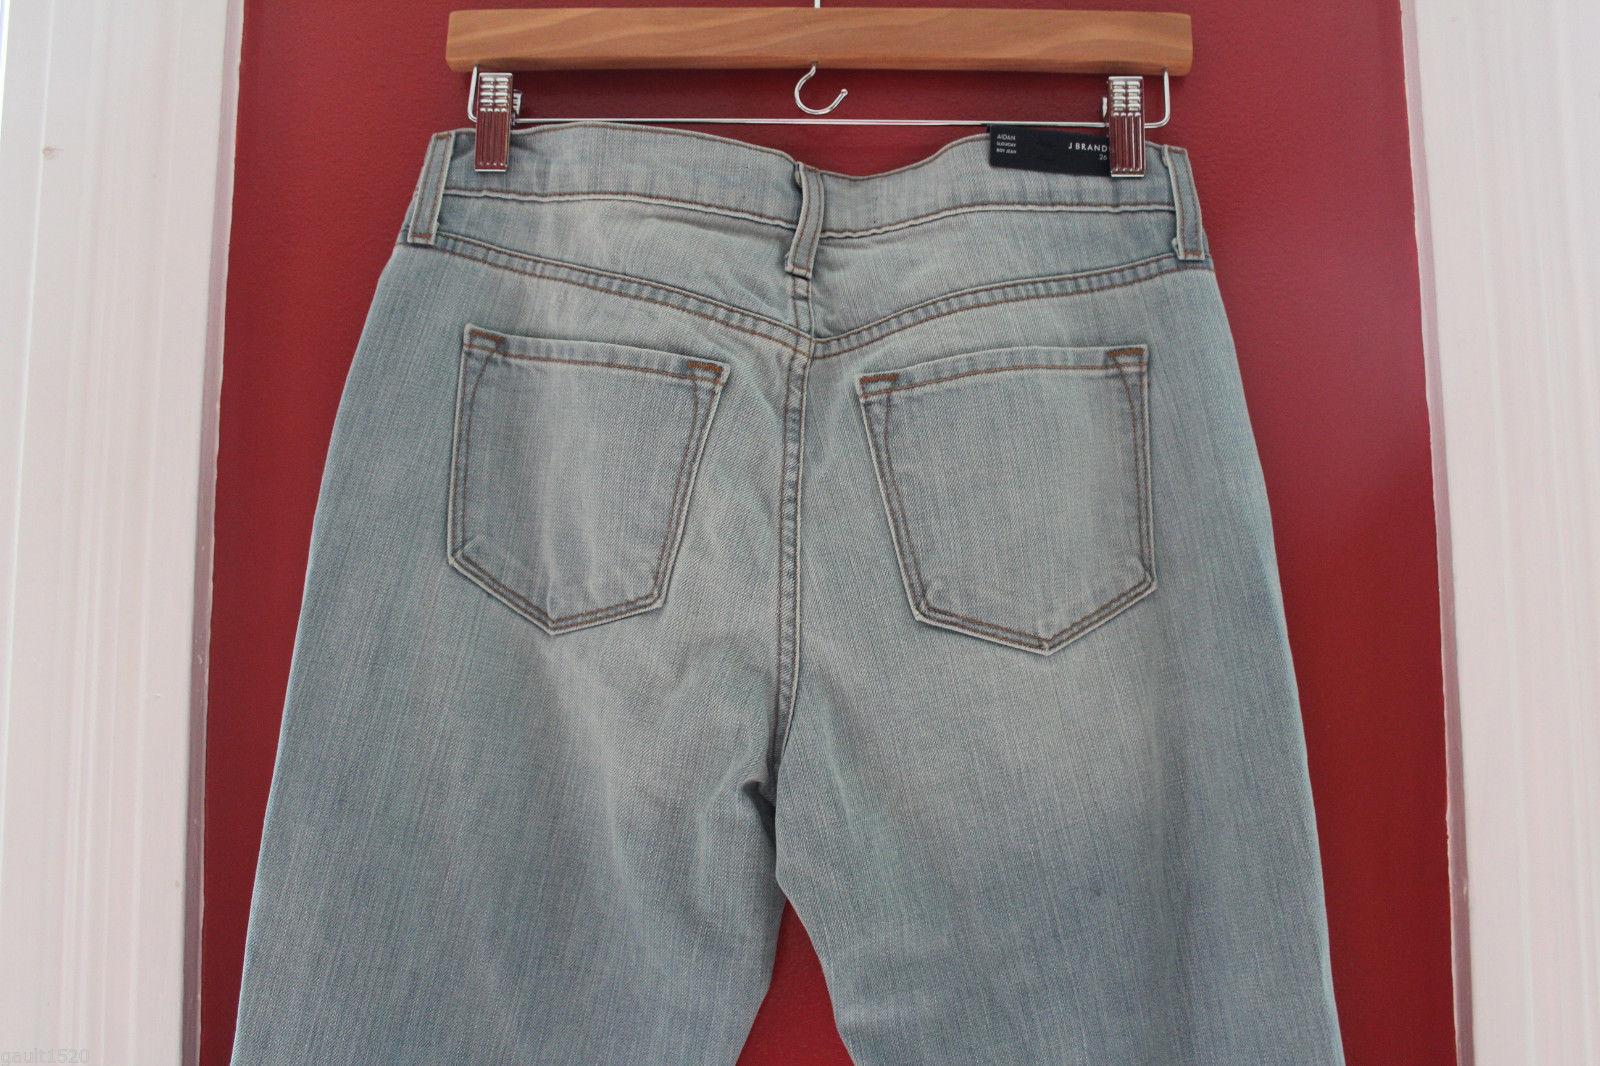 NWT J BRAND Designer Women's Aidan Slouchy Boy Jeans Denim Pants 26 2 $359 image 8